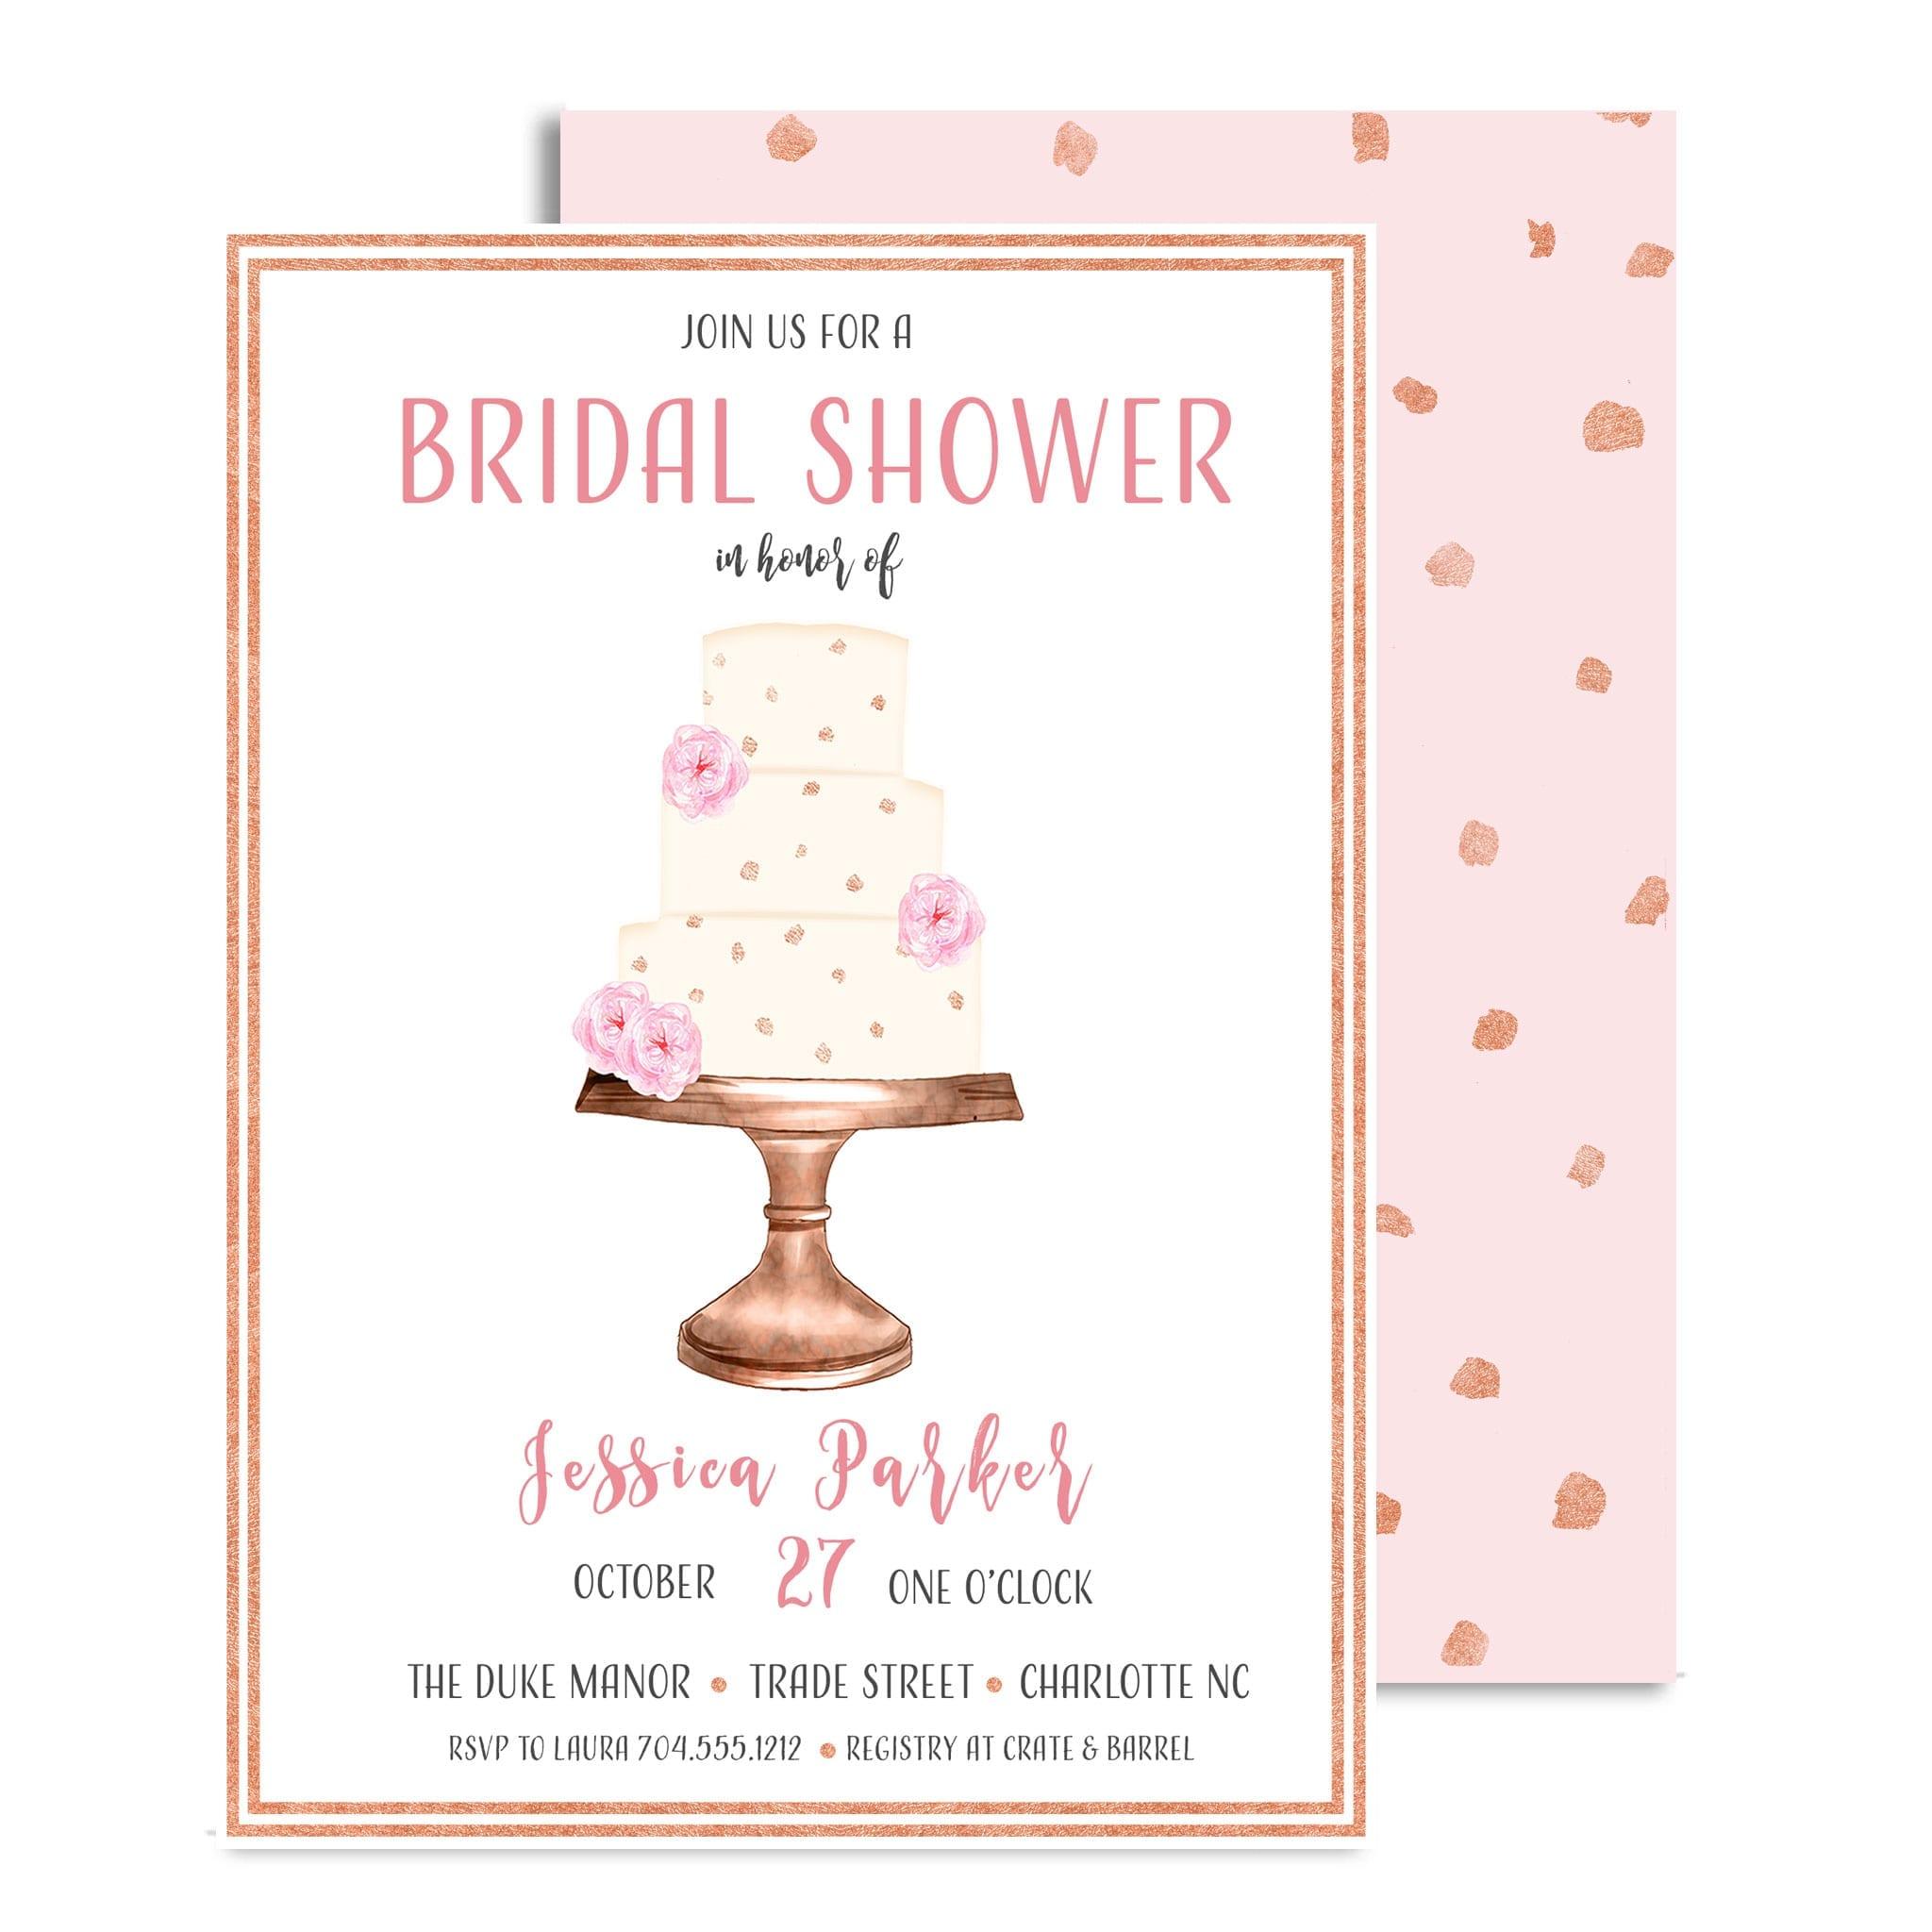 Decadence Cake Bridal Shower Invitations | Posh Paper + Ink